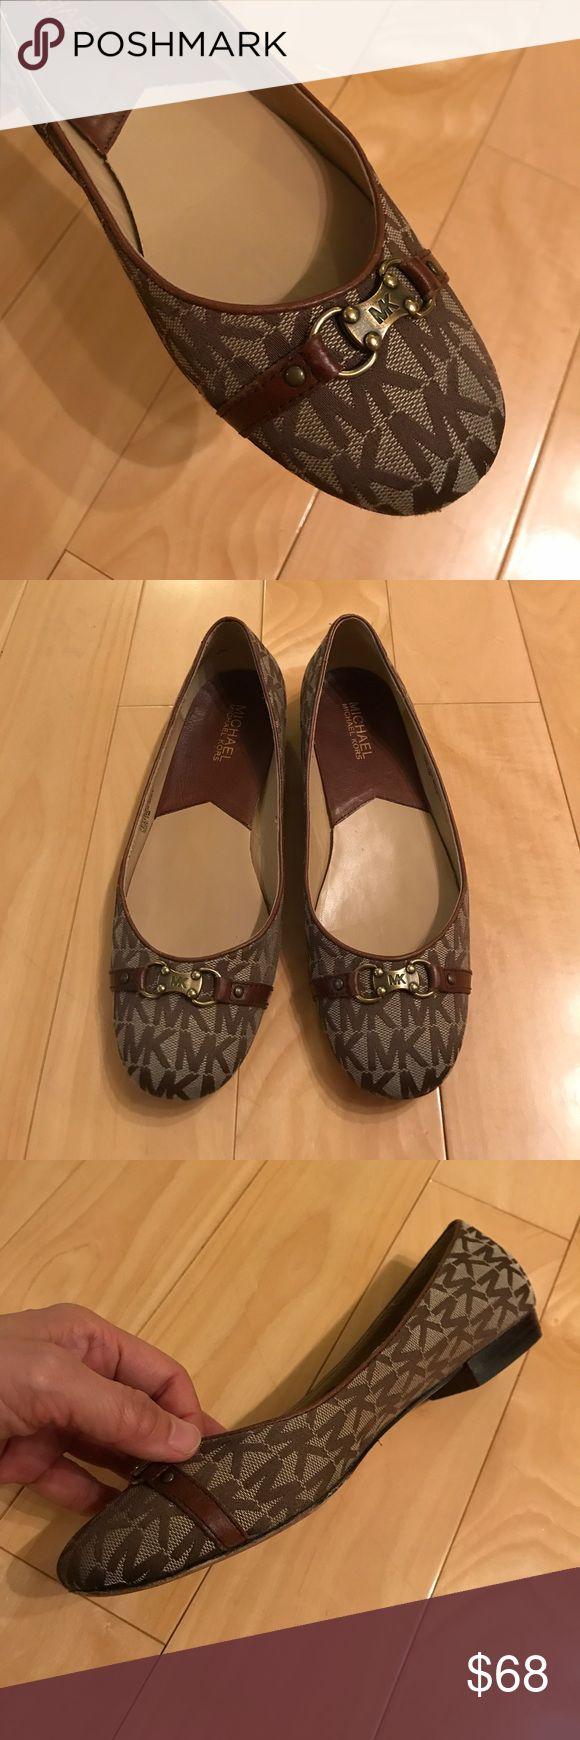 Michael Kors flats EUC Michael Kors Cara Ballet flats, with original box, very clean inside, worn a couple times. Michael Kors Shoes Flats & Loafers